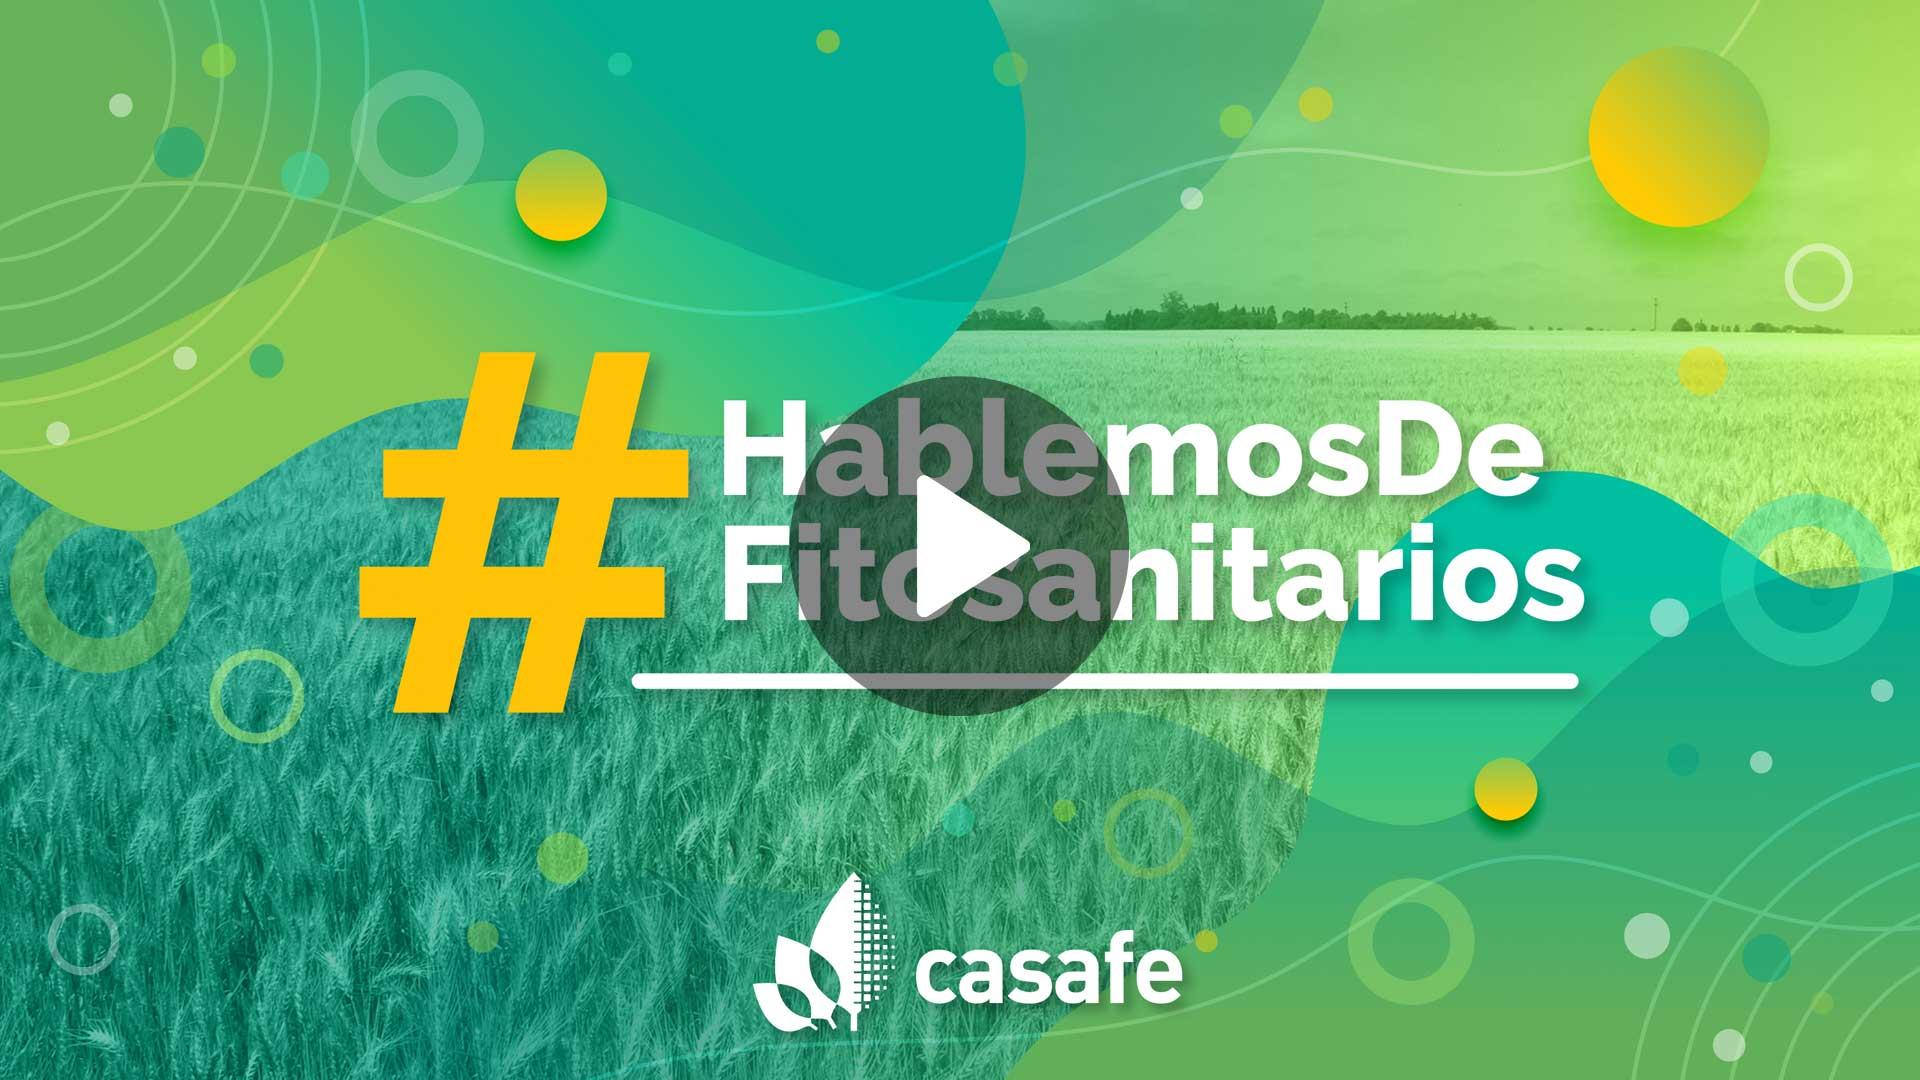 video-casafe-HablemosDeFitosanitarios